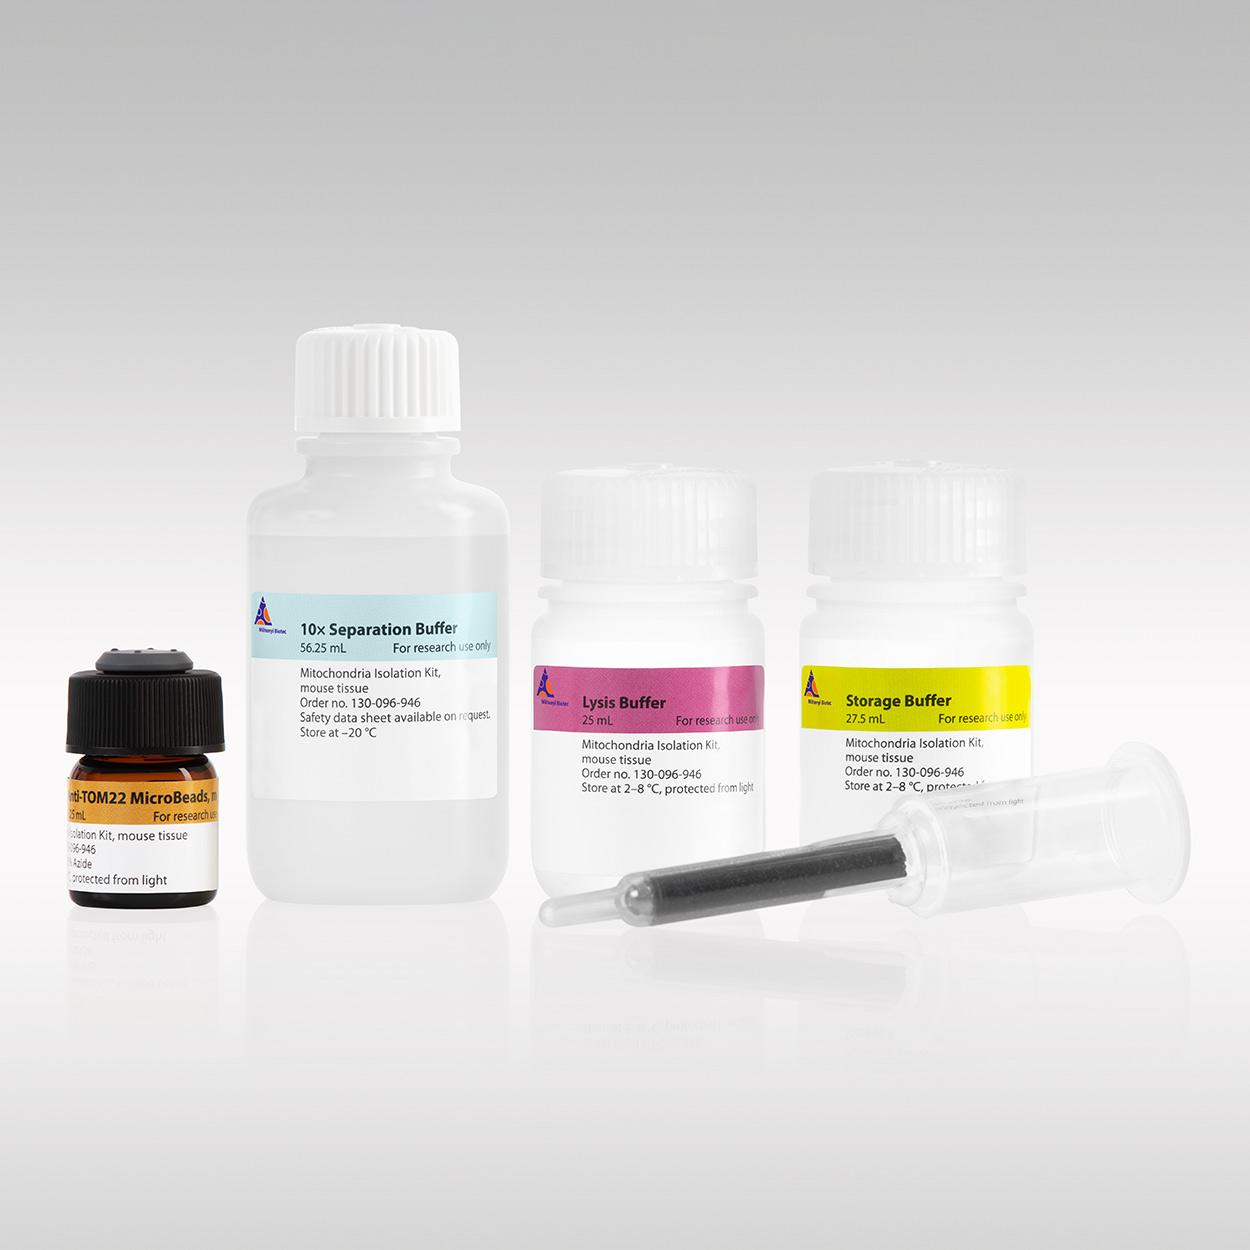 Mitochondria Isolation Kit, human